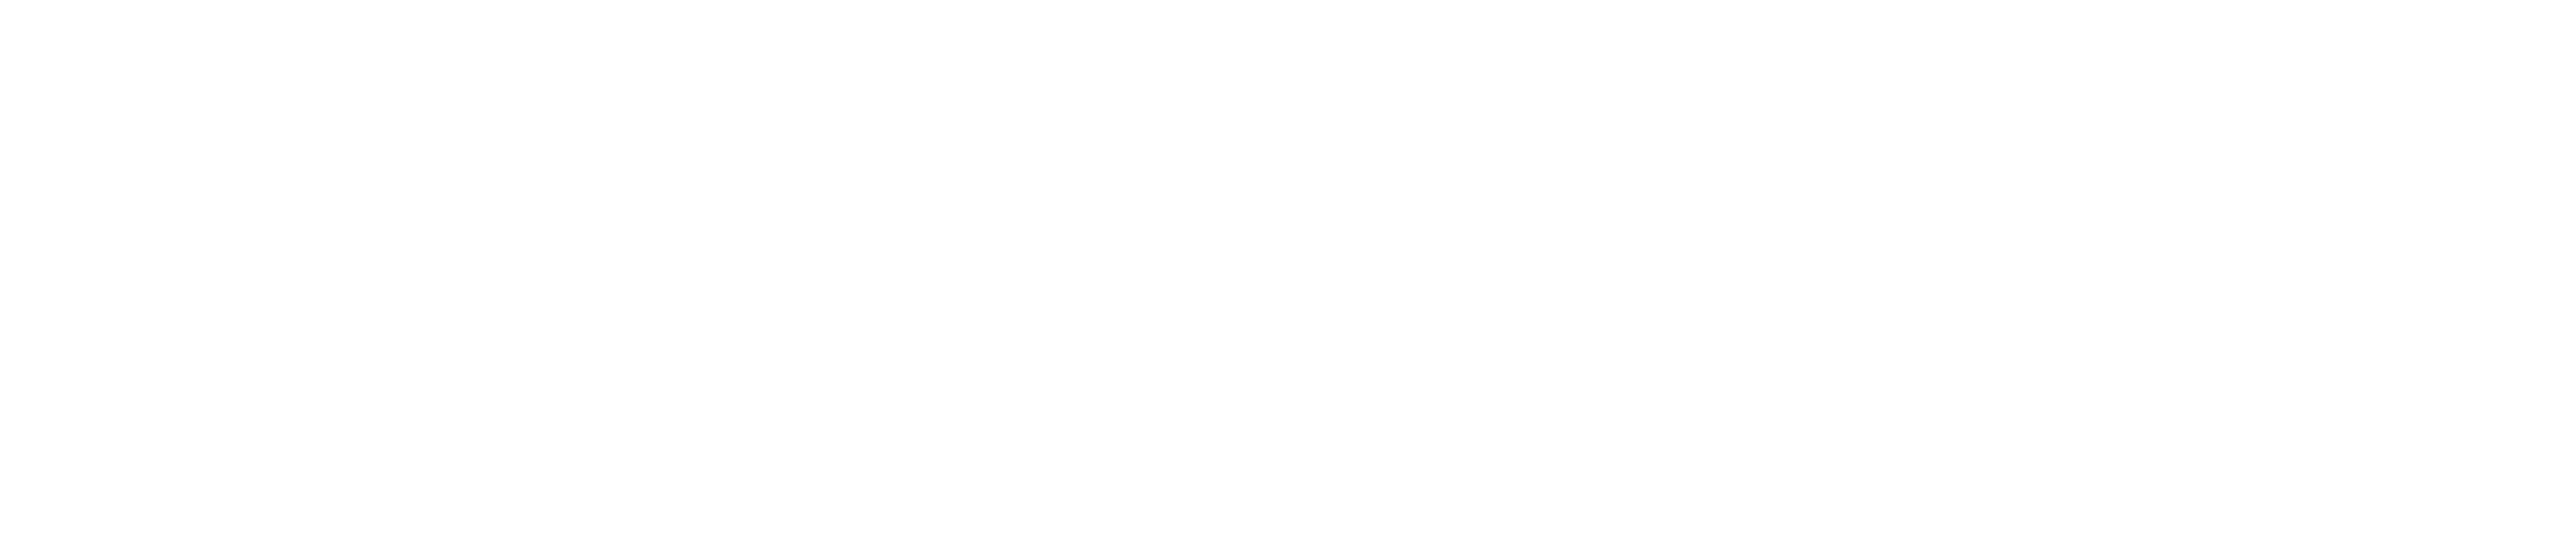 A Personal Organizer | Professional Organizer Glenview